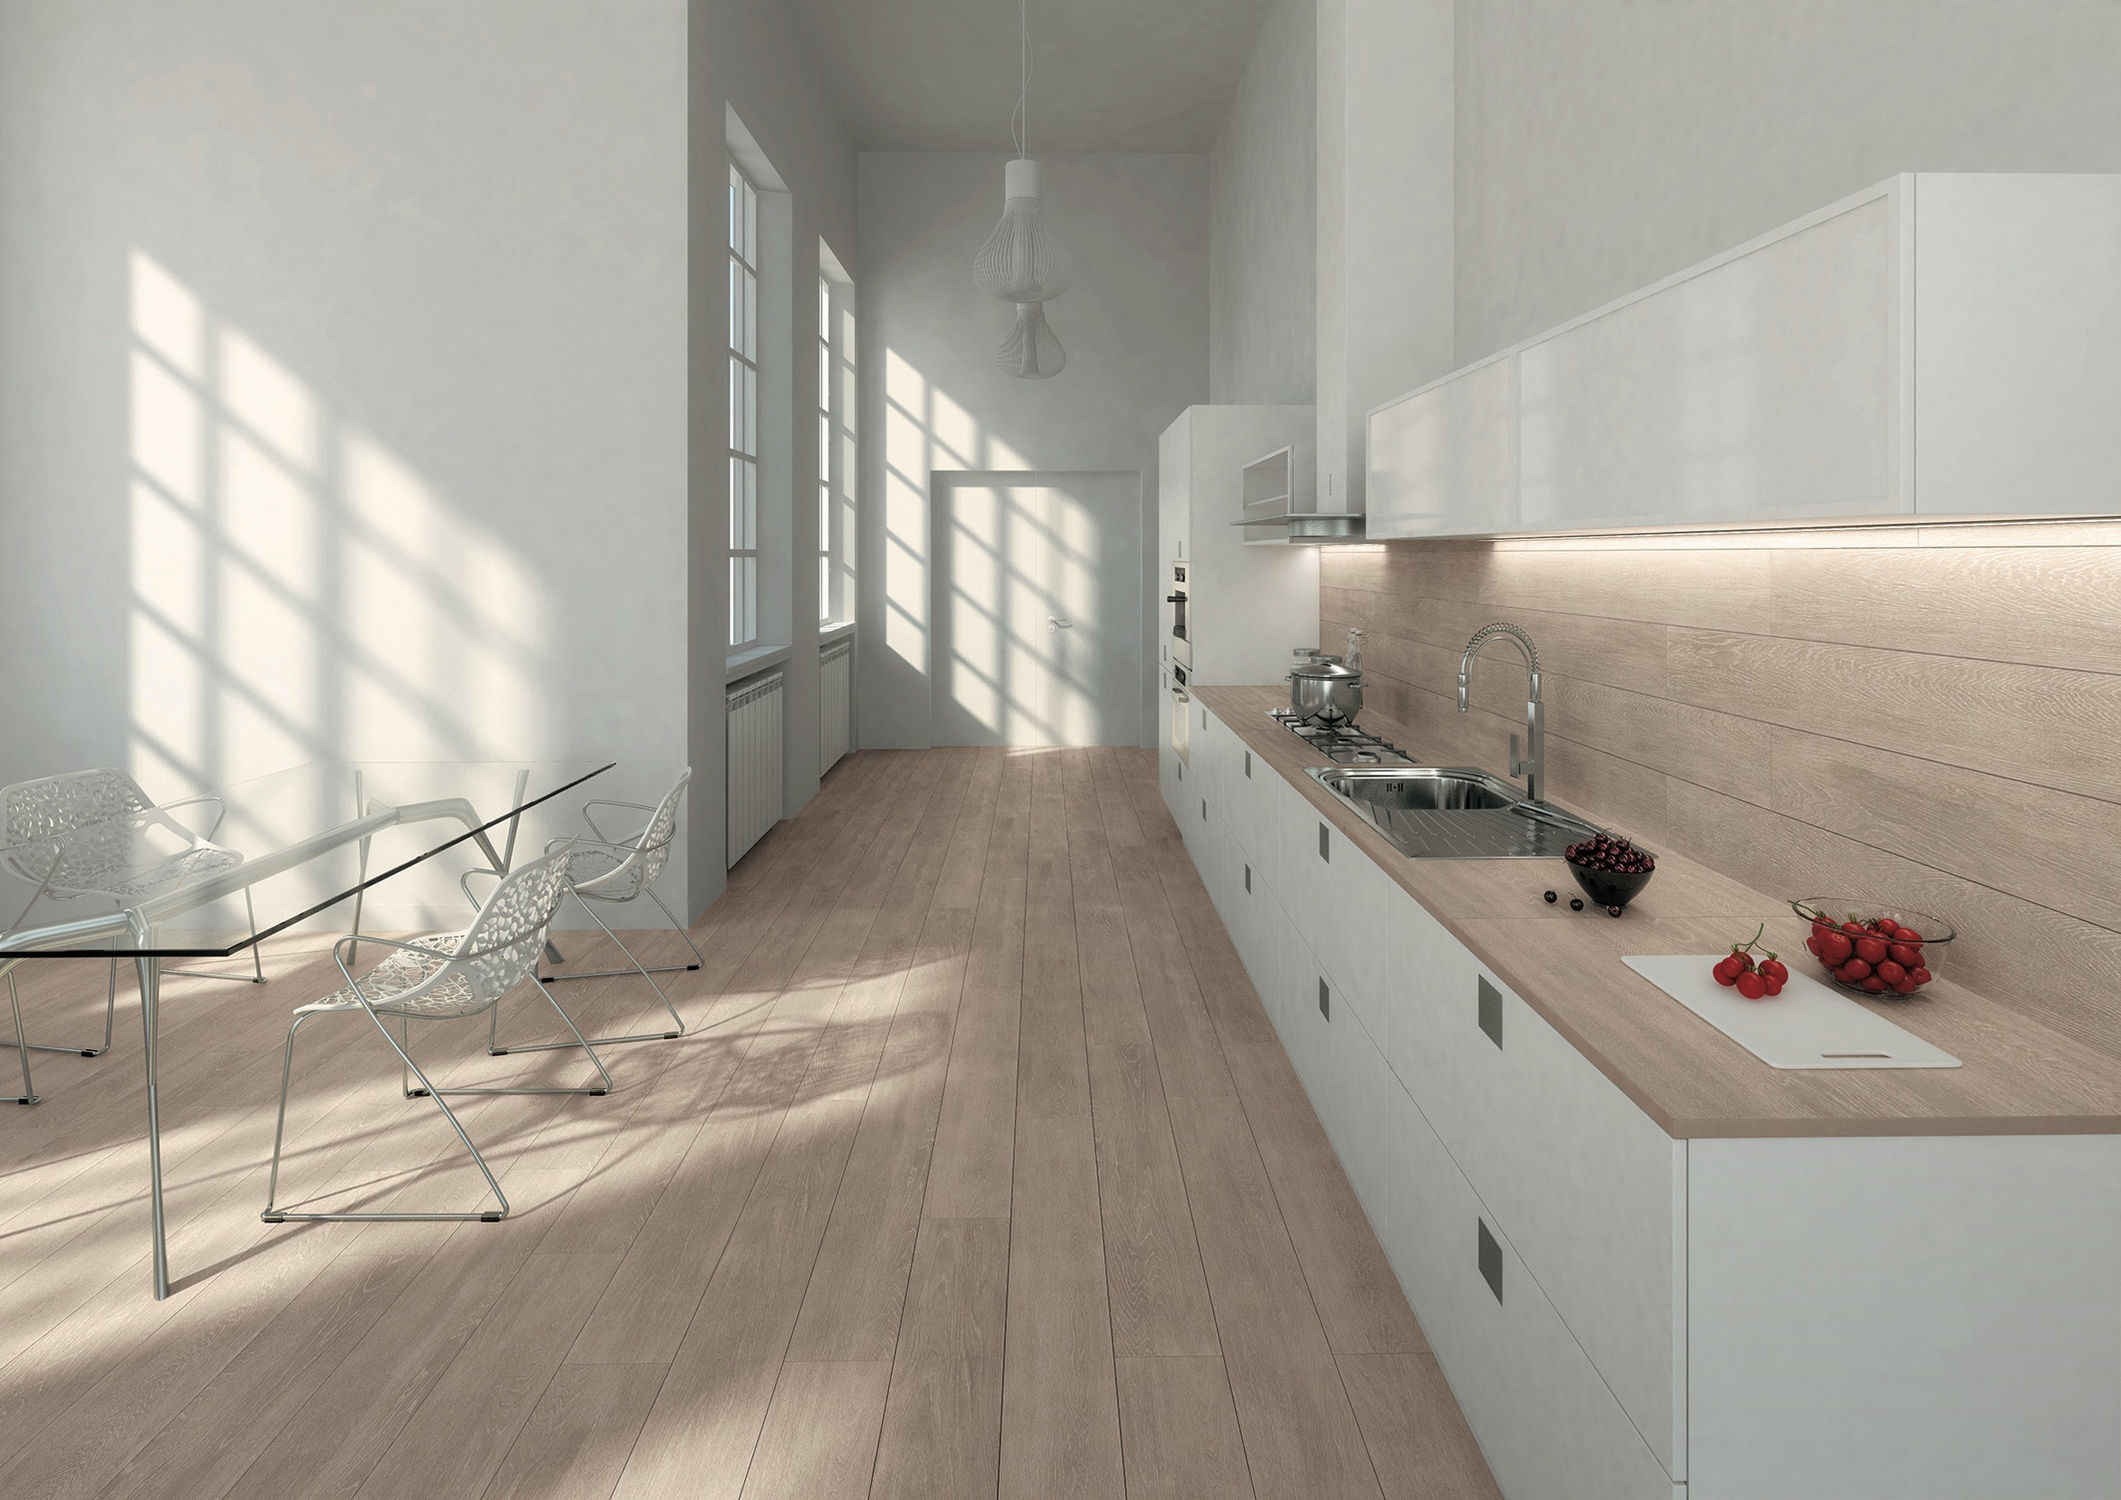 Pavimento Bianco Grigio : Adesivo per piastrelle adekoll as extra flex grigio a bancale